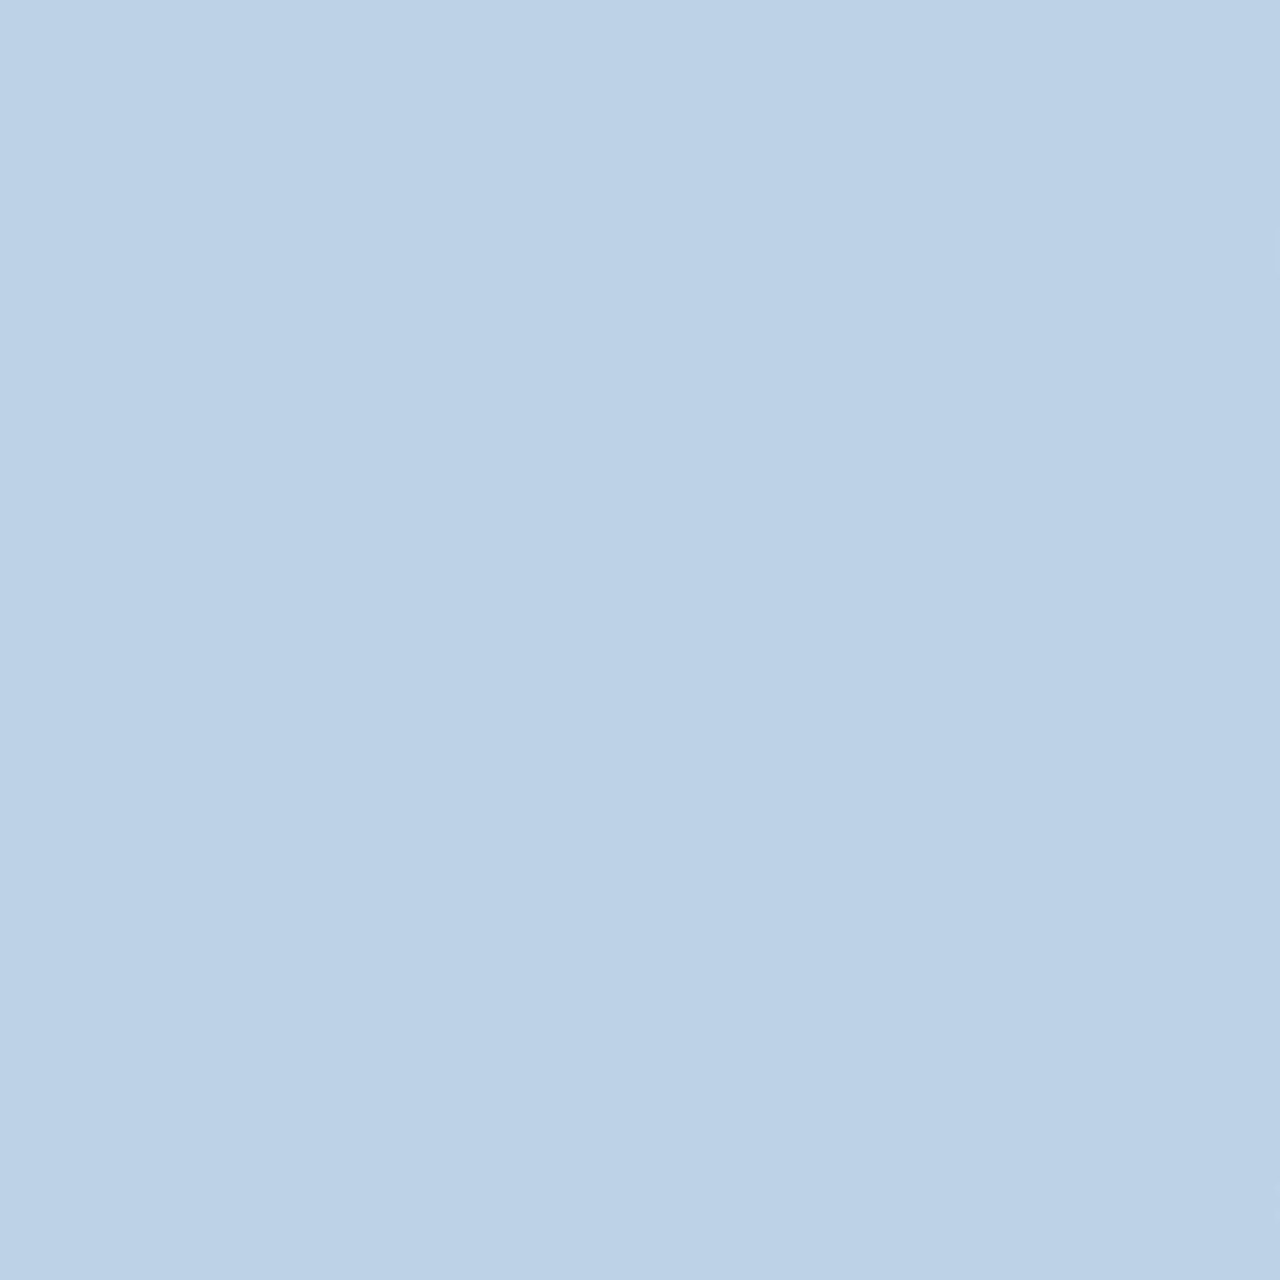 "Lee Gels Roll #203 Qtr C.T.Blue 48"" x 25'"